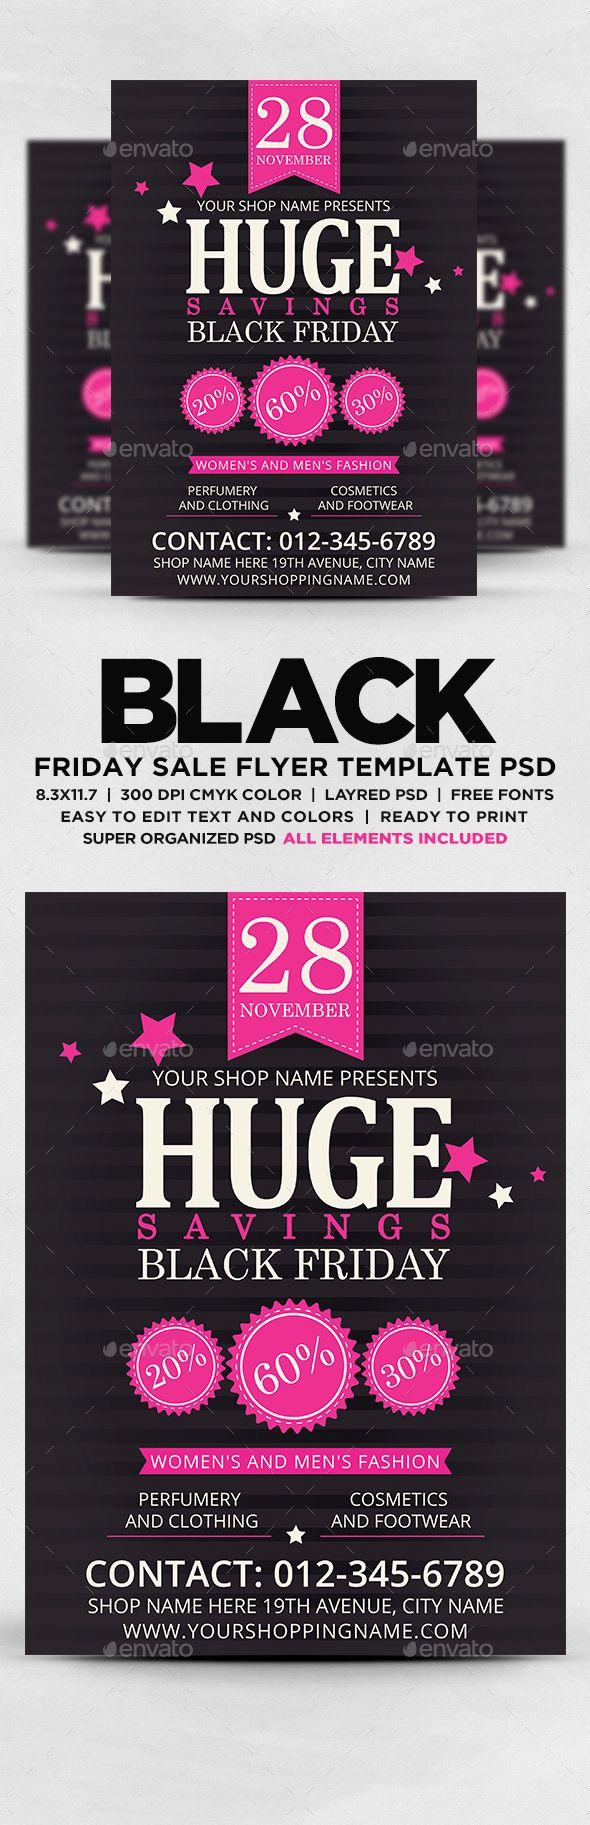 sales flyer template hobit fullring co